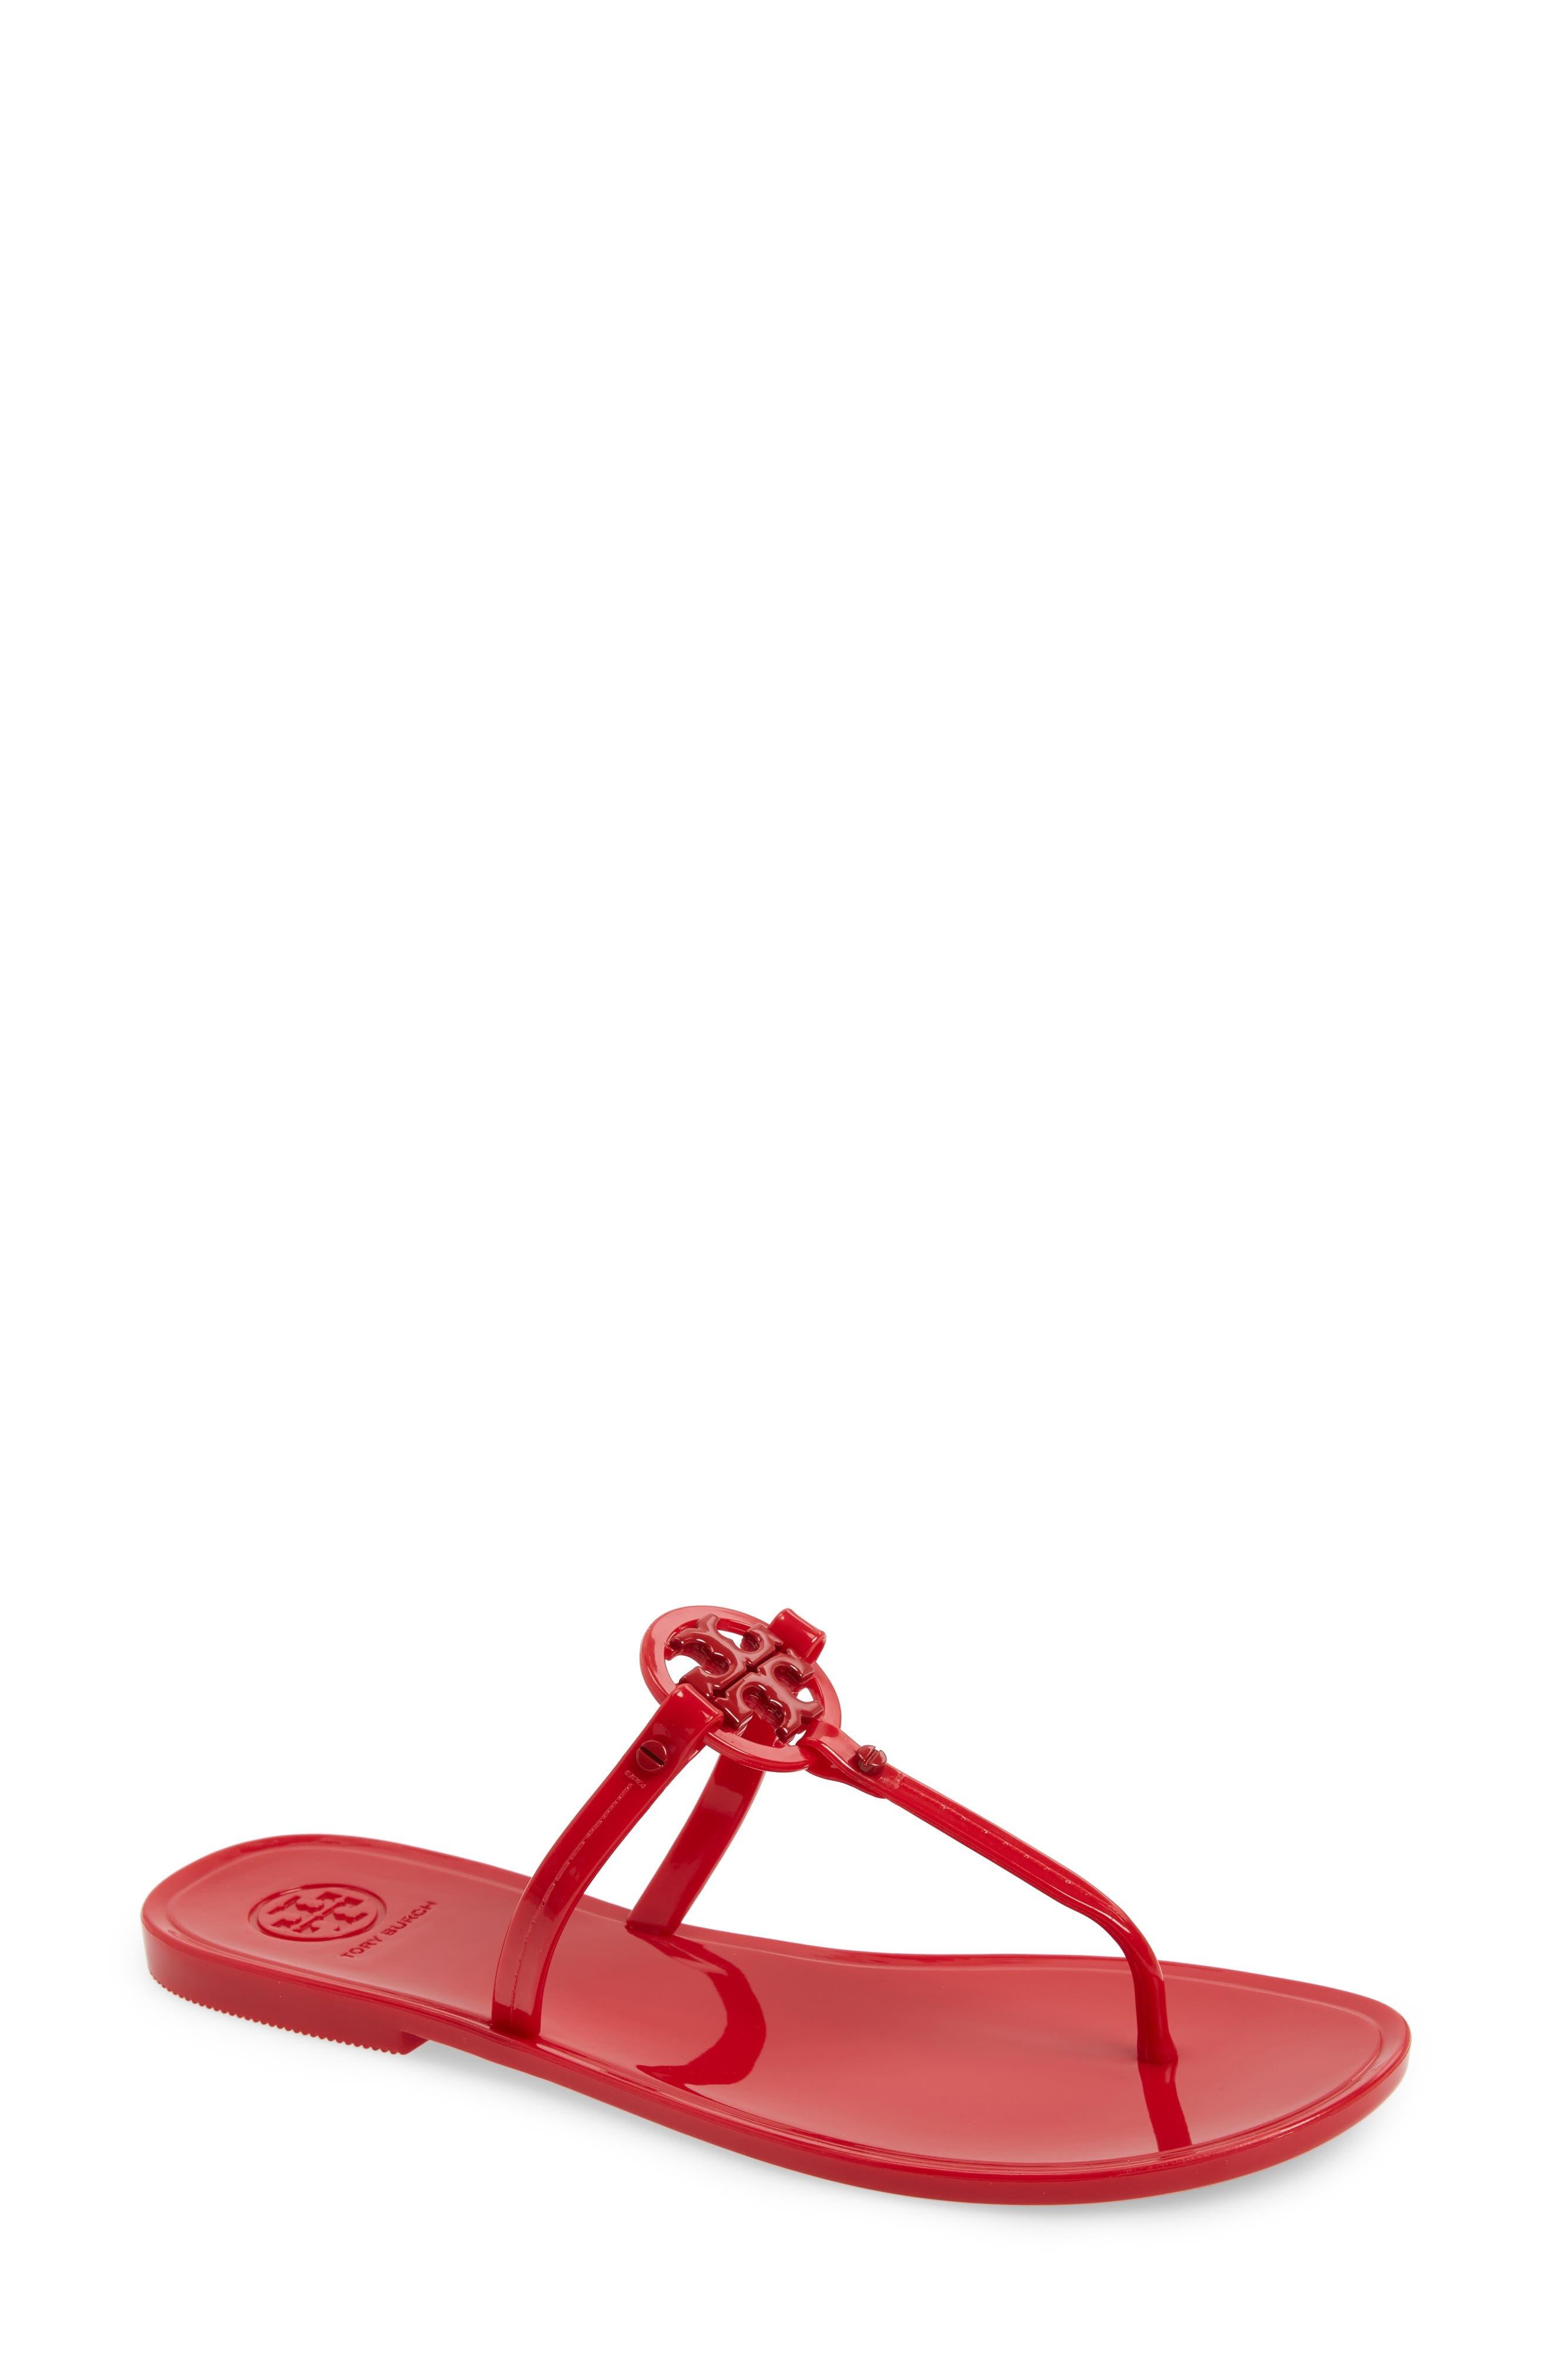 'mini Miller' Flat Sandal by Tory Burch